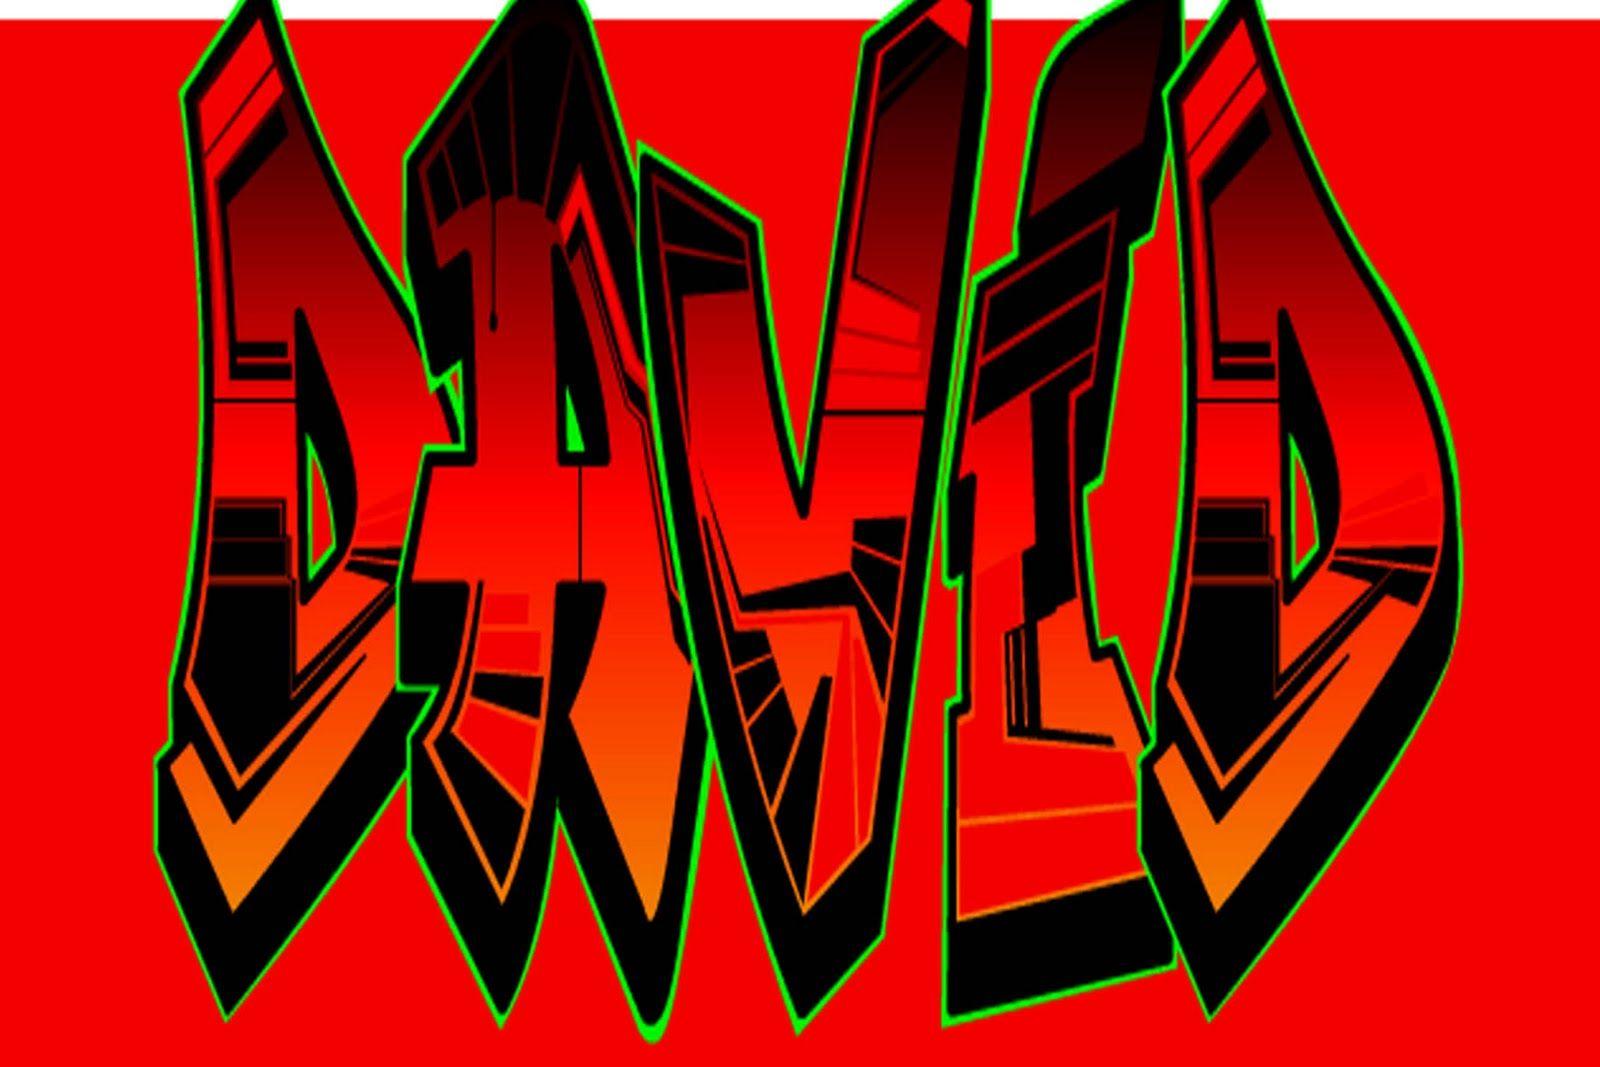 The Name David In Funny Graffiti Style Bubble Fonts Gl Stock Images Graffiti Lettering Graffiti Creator Graffiti